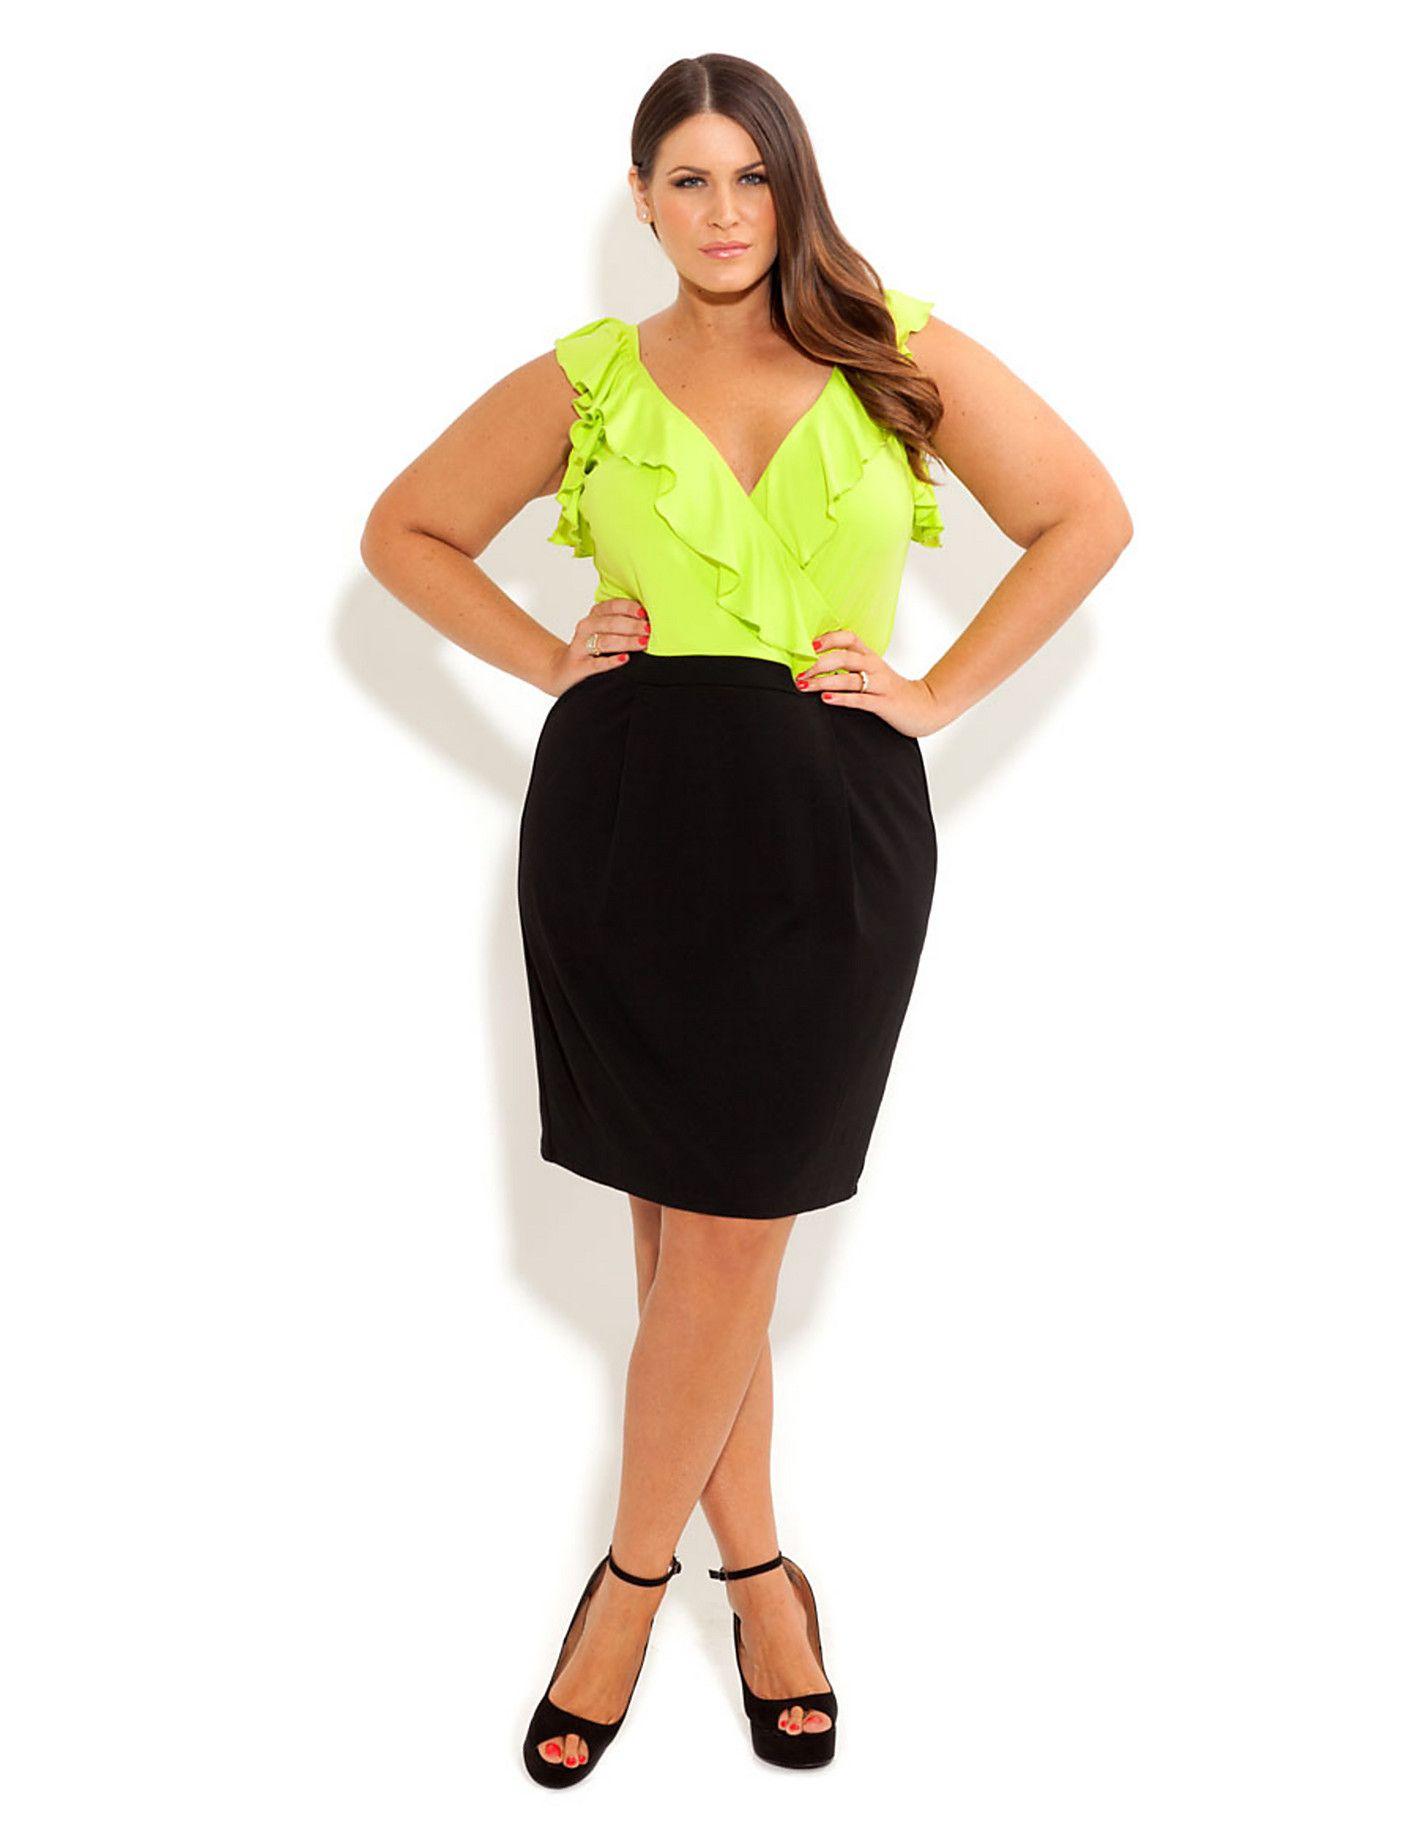 Floral Pop Dress 9352315400893 | RVCA